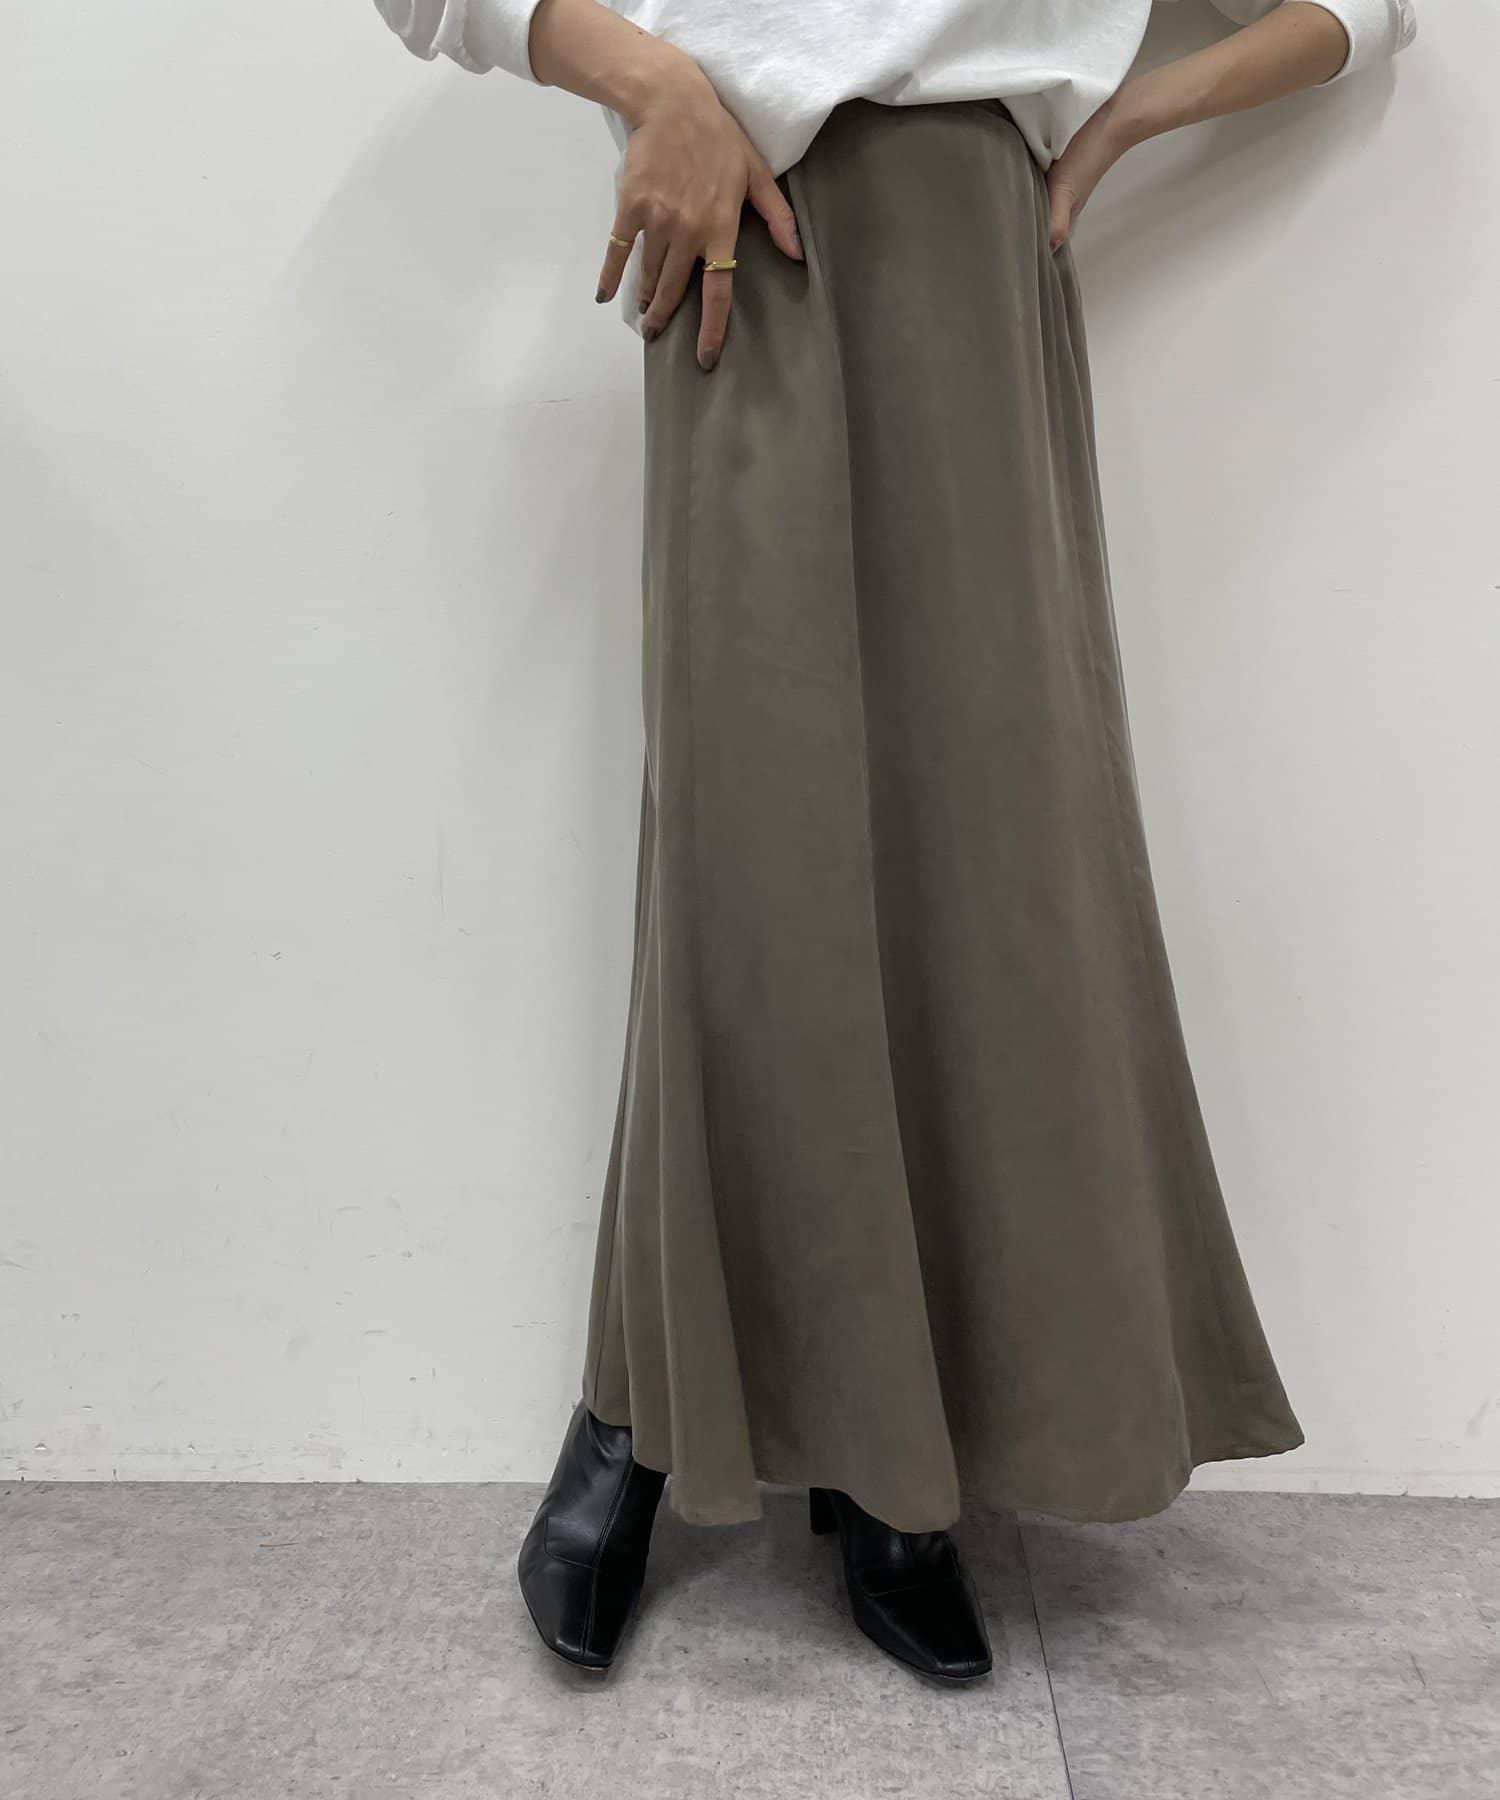 Loungedress(ラウンジドレス) フィブリルマキシスカート